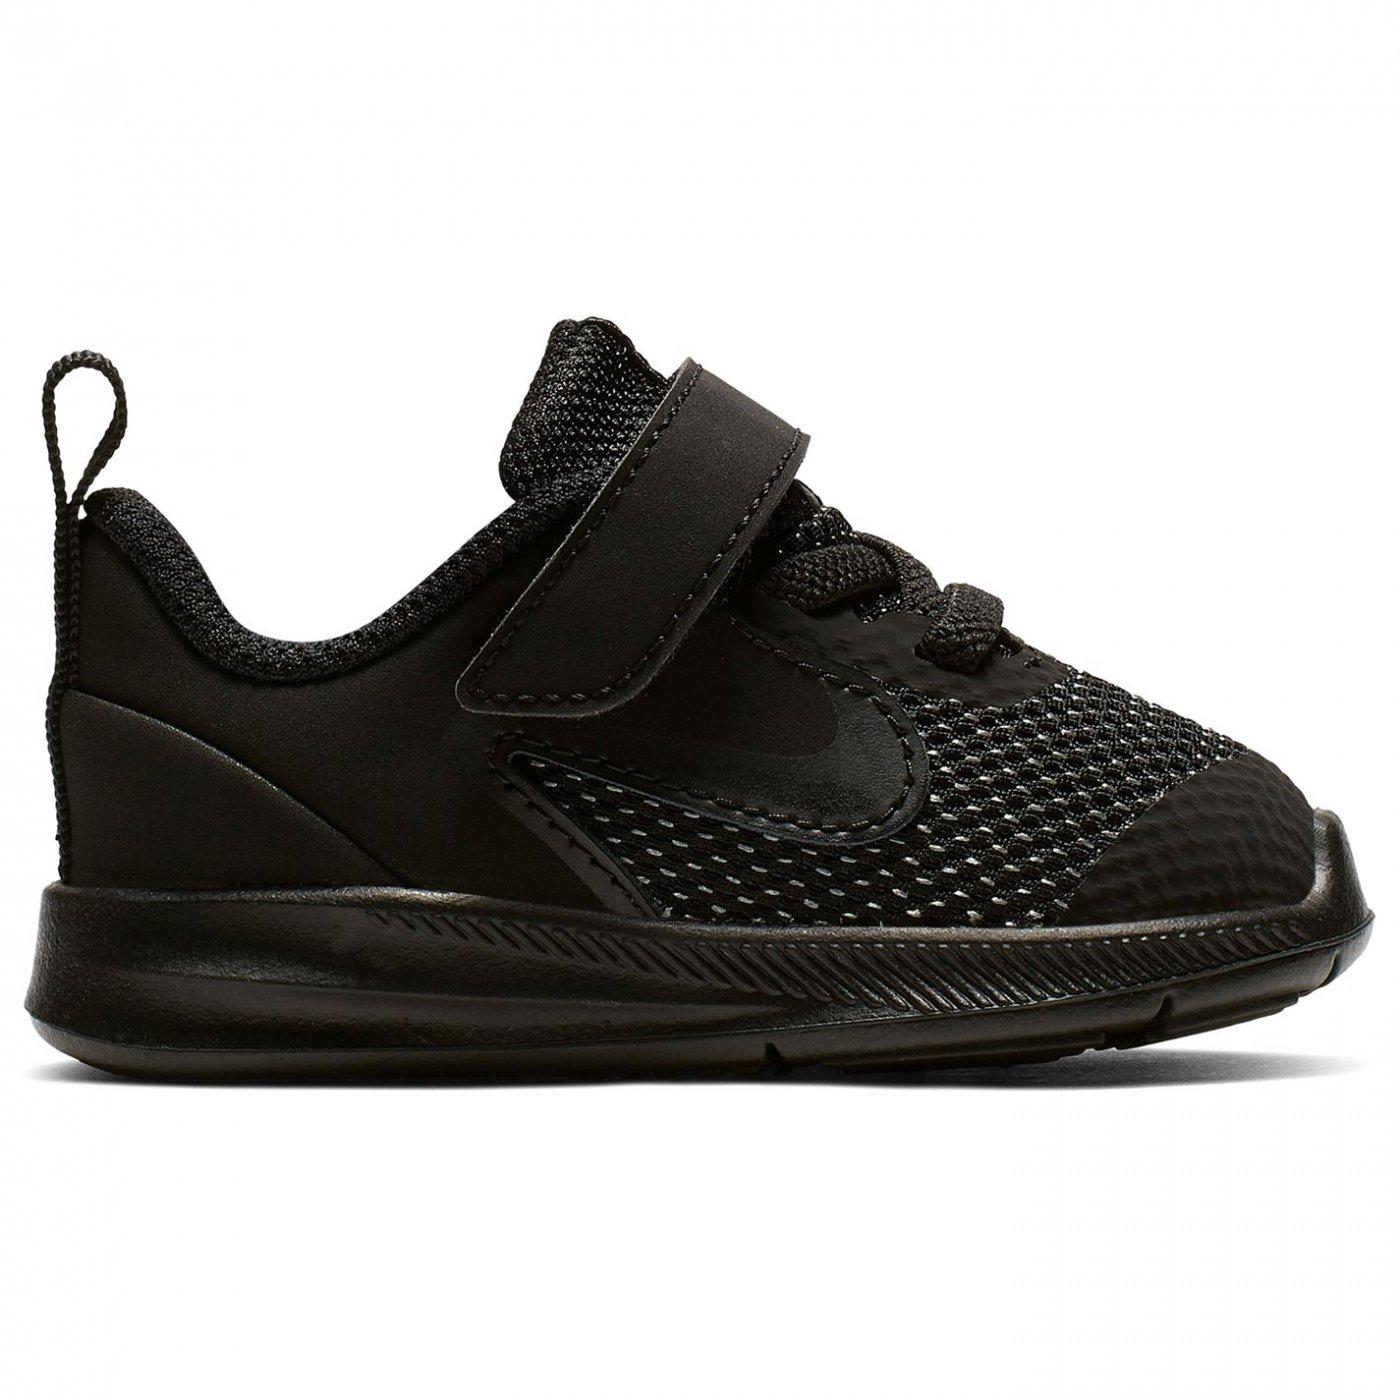 big sale 726ba be26f ... Nike - Downshifter 9 Inf00. Novo -19% ...